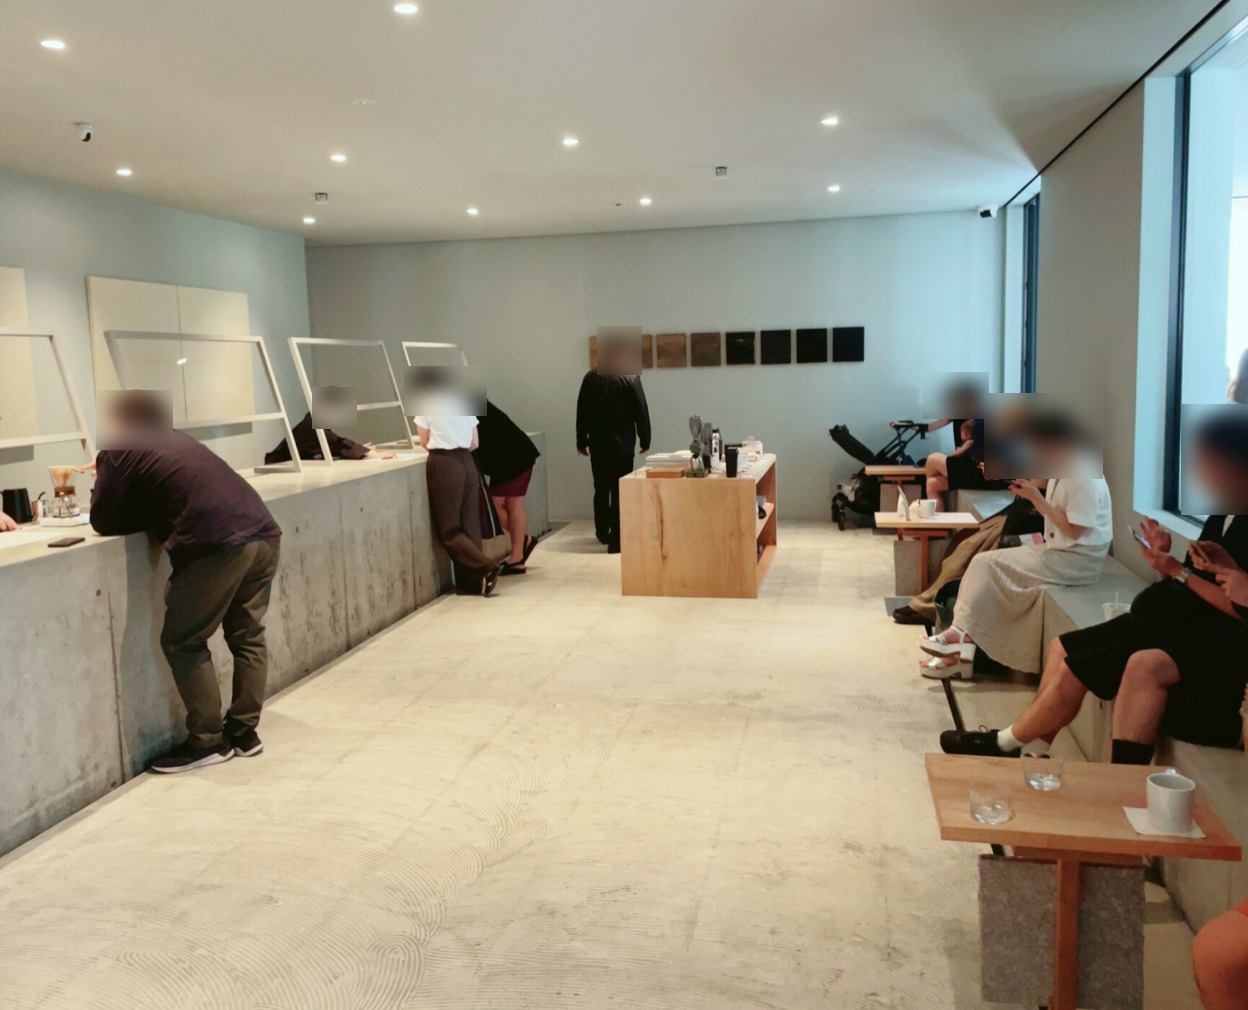 OGAWA COFFEE LABORATORY 下北沢店の店内の様子